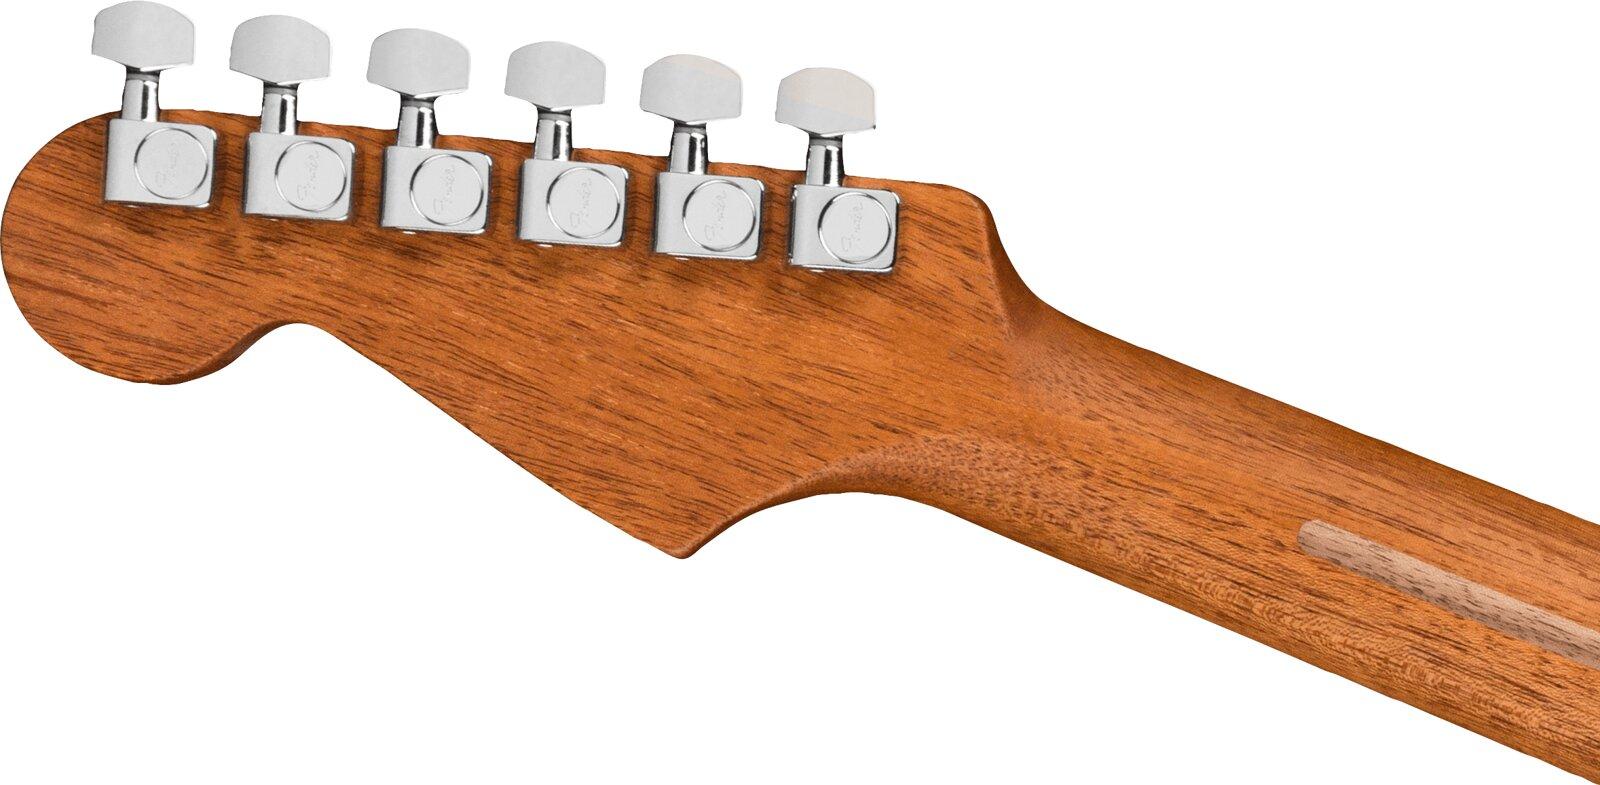 Fender American Acoustasonic Jazzmaster Tungsen Ebony Fingerboard : photo 5